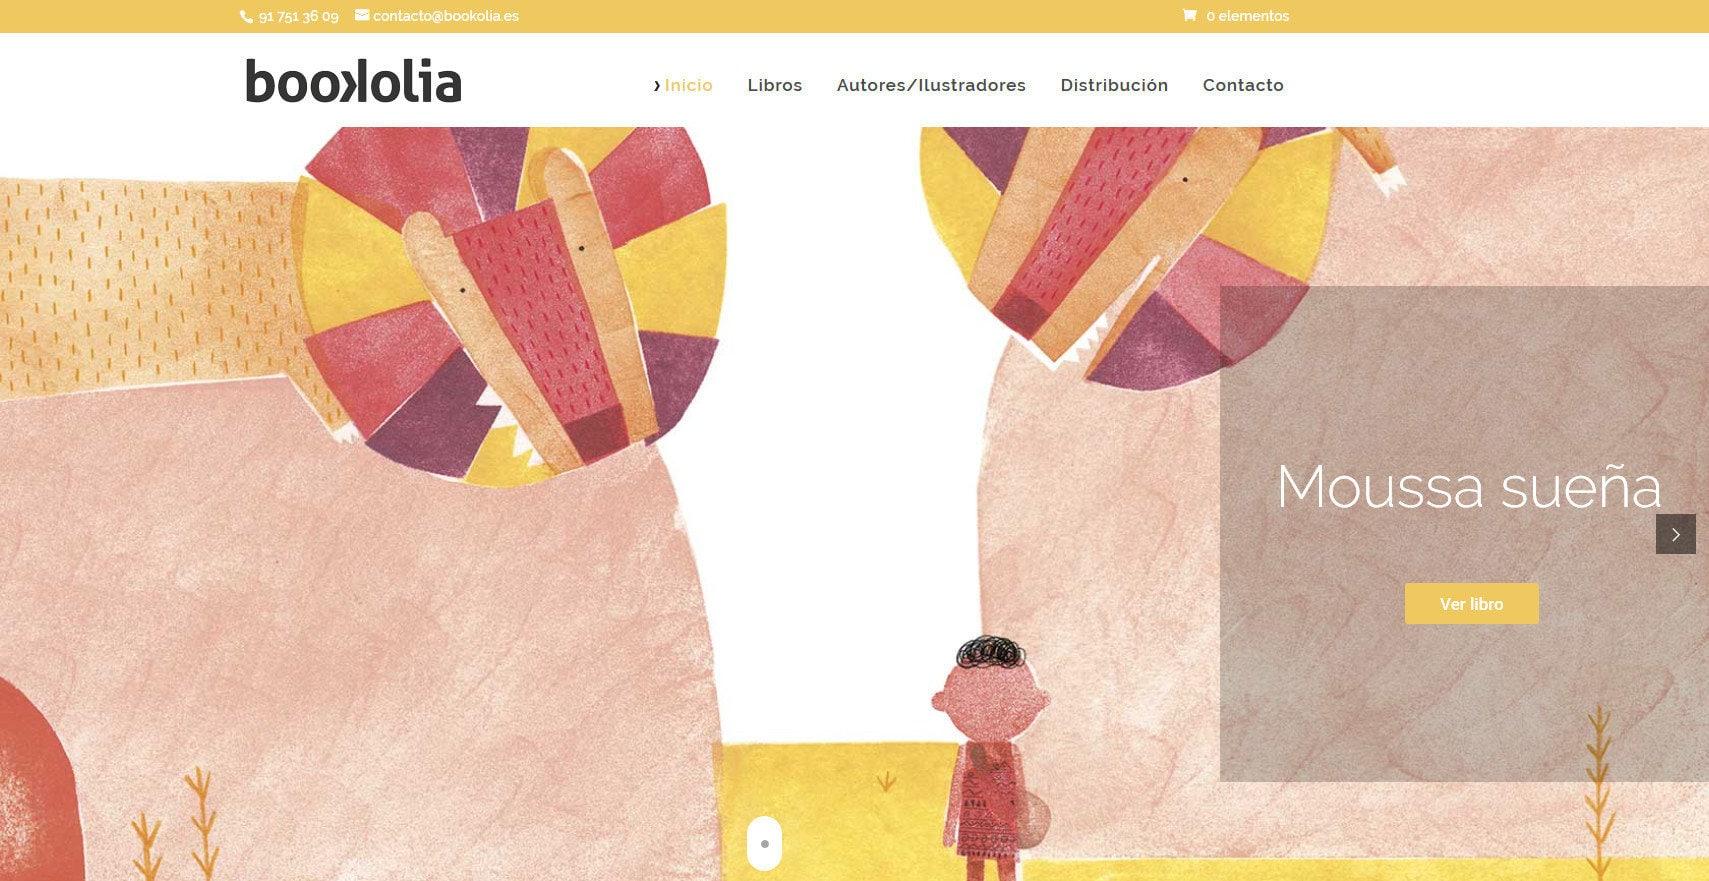 Pagina Web Empresa Libros